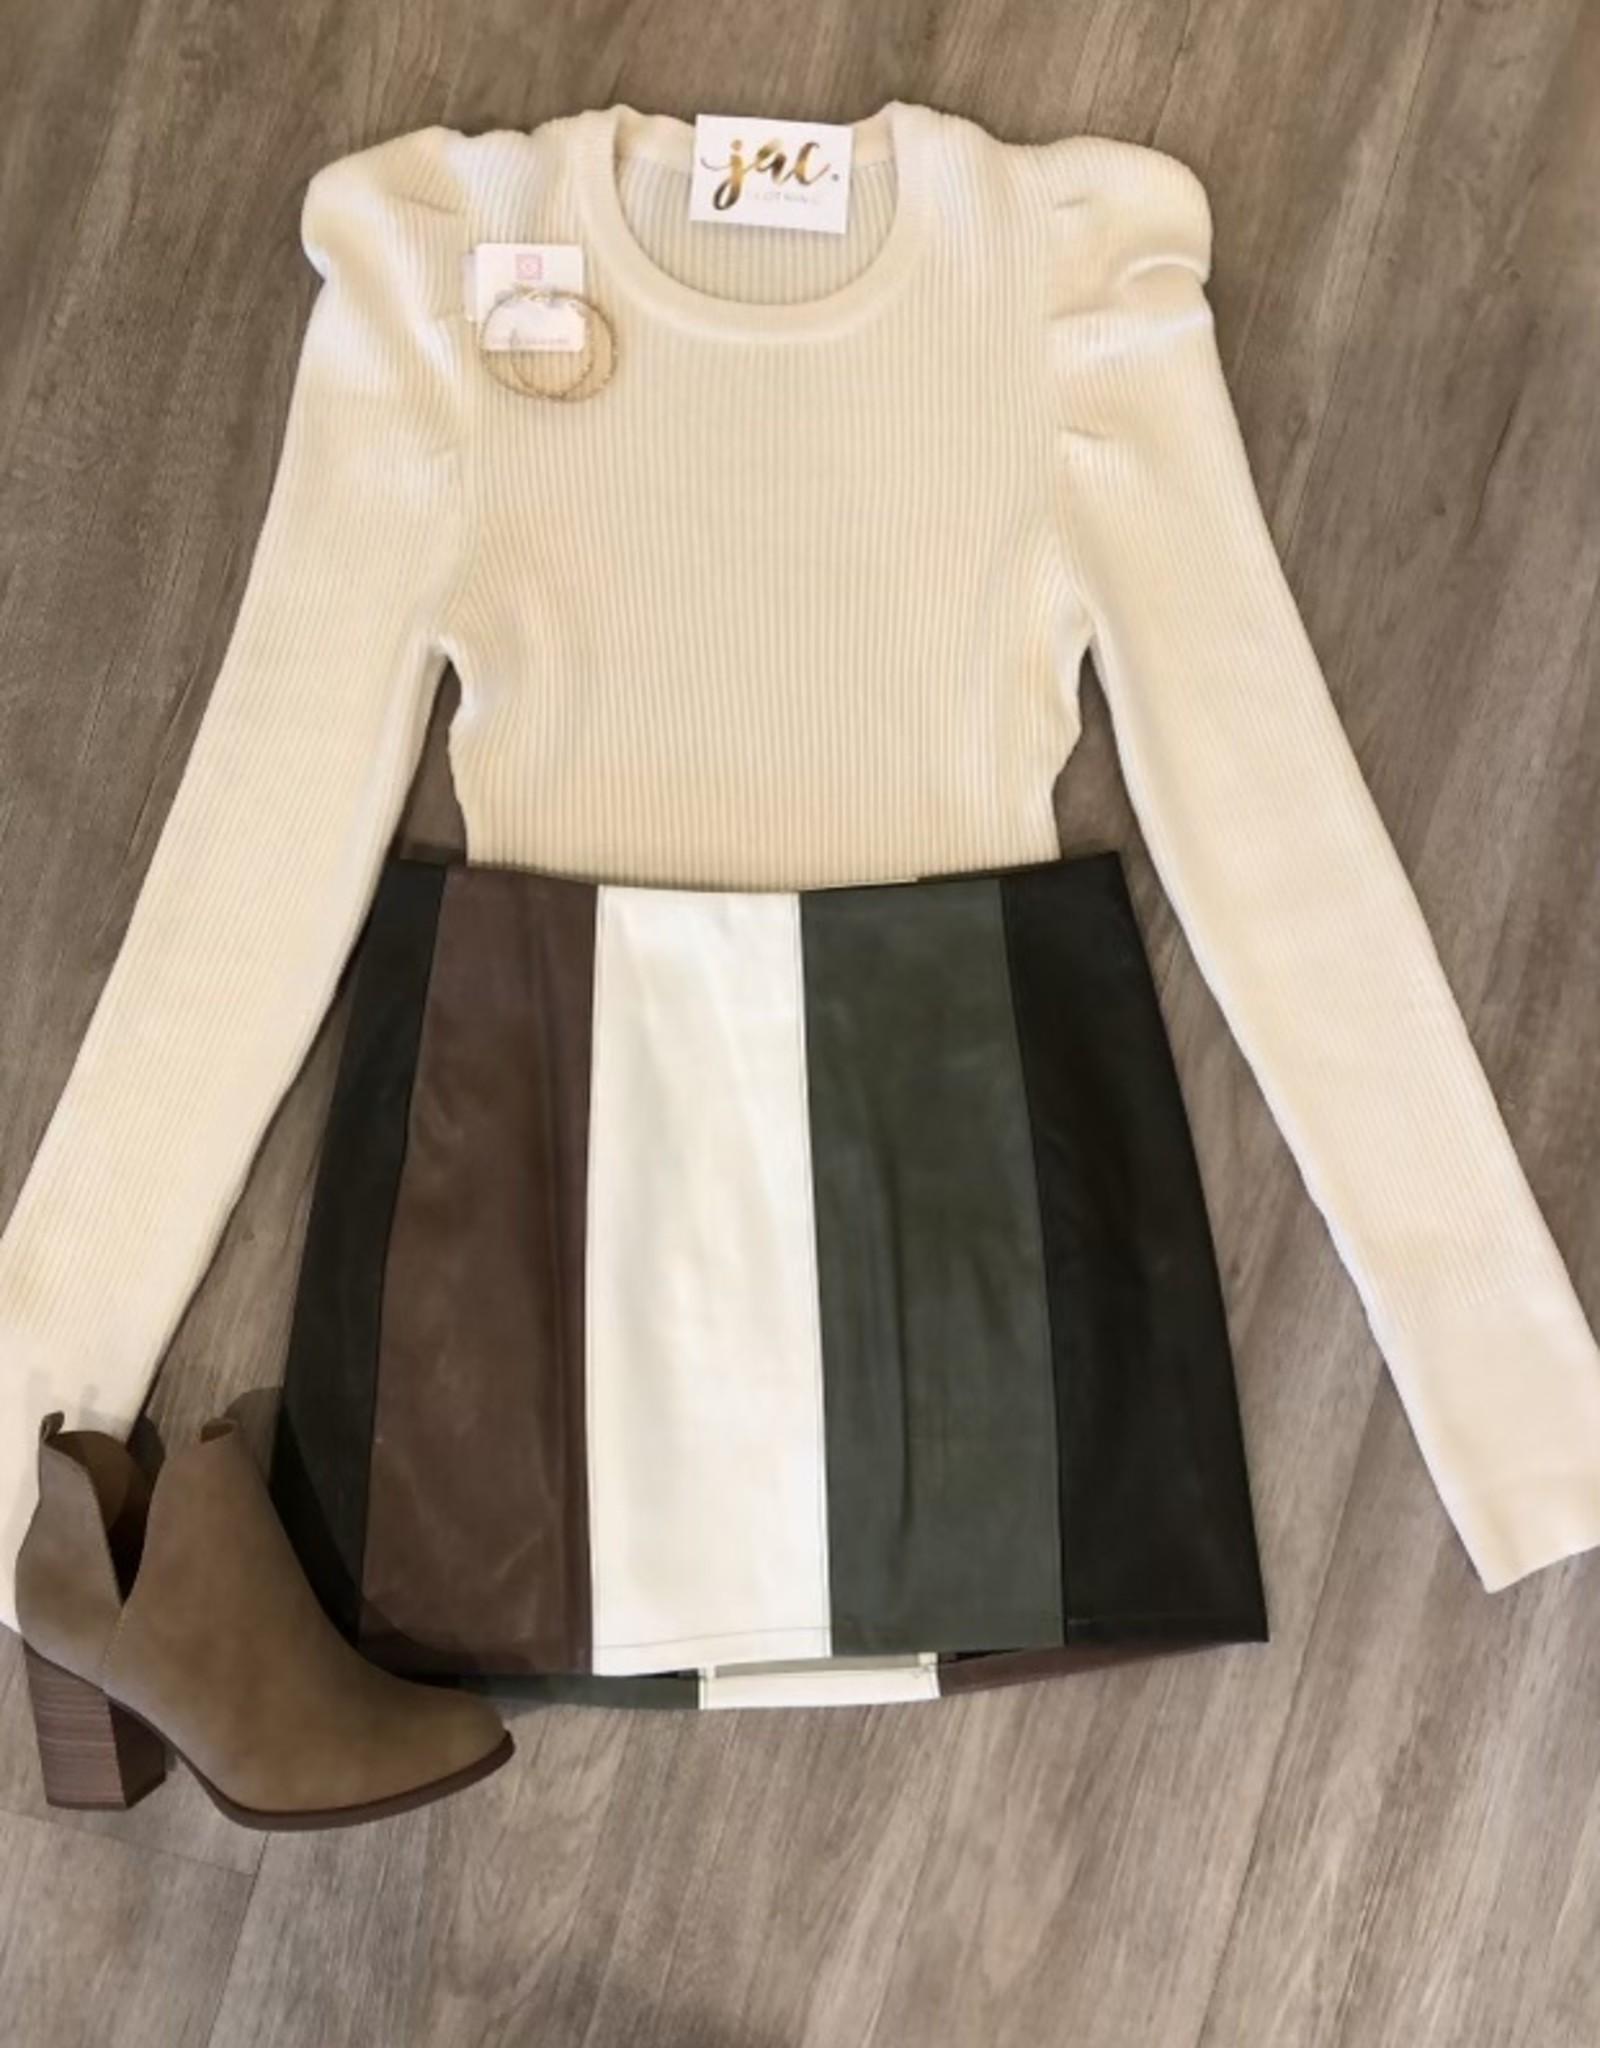 le lis Sage The Day Skirt